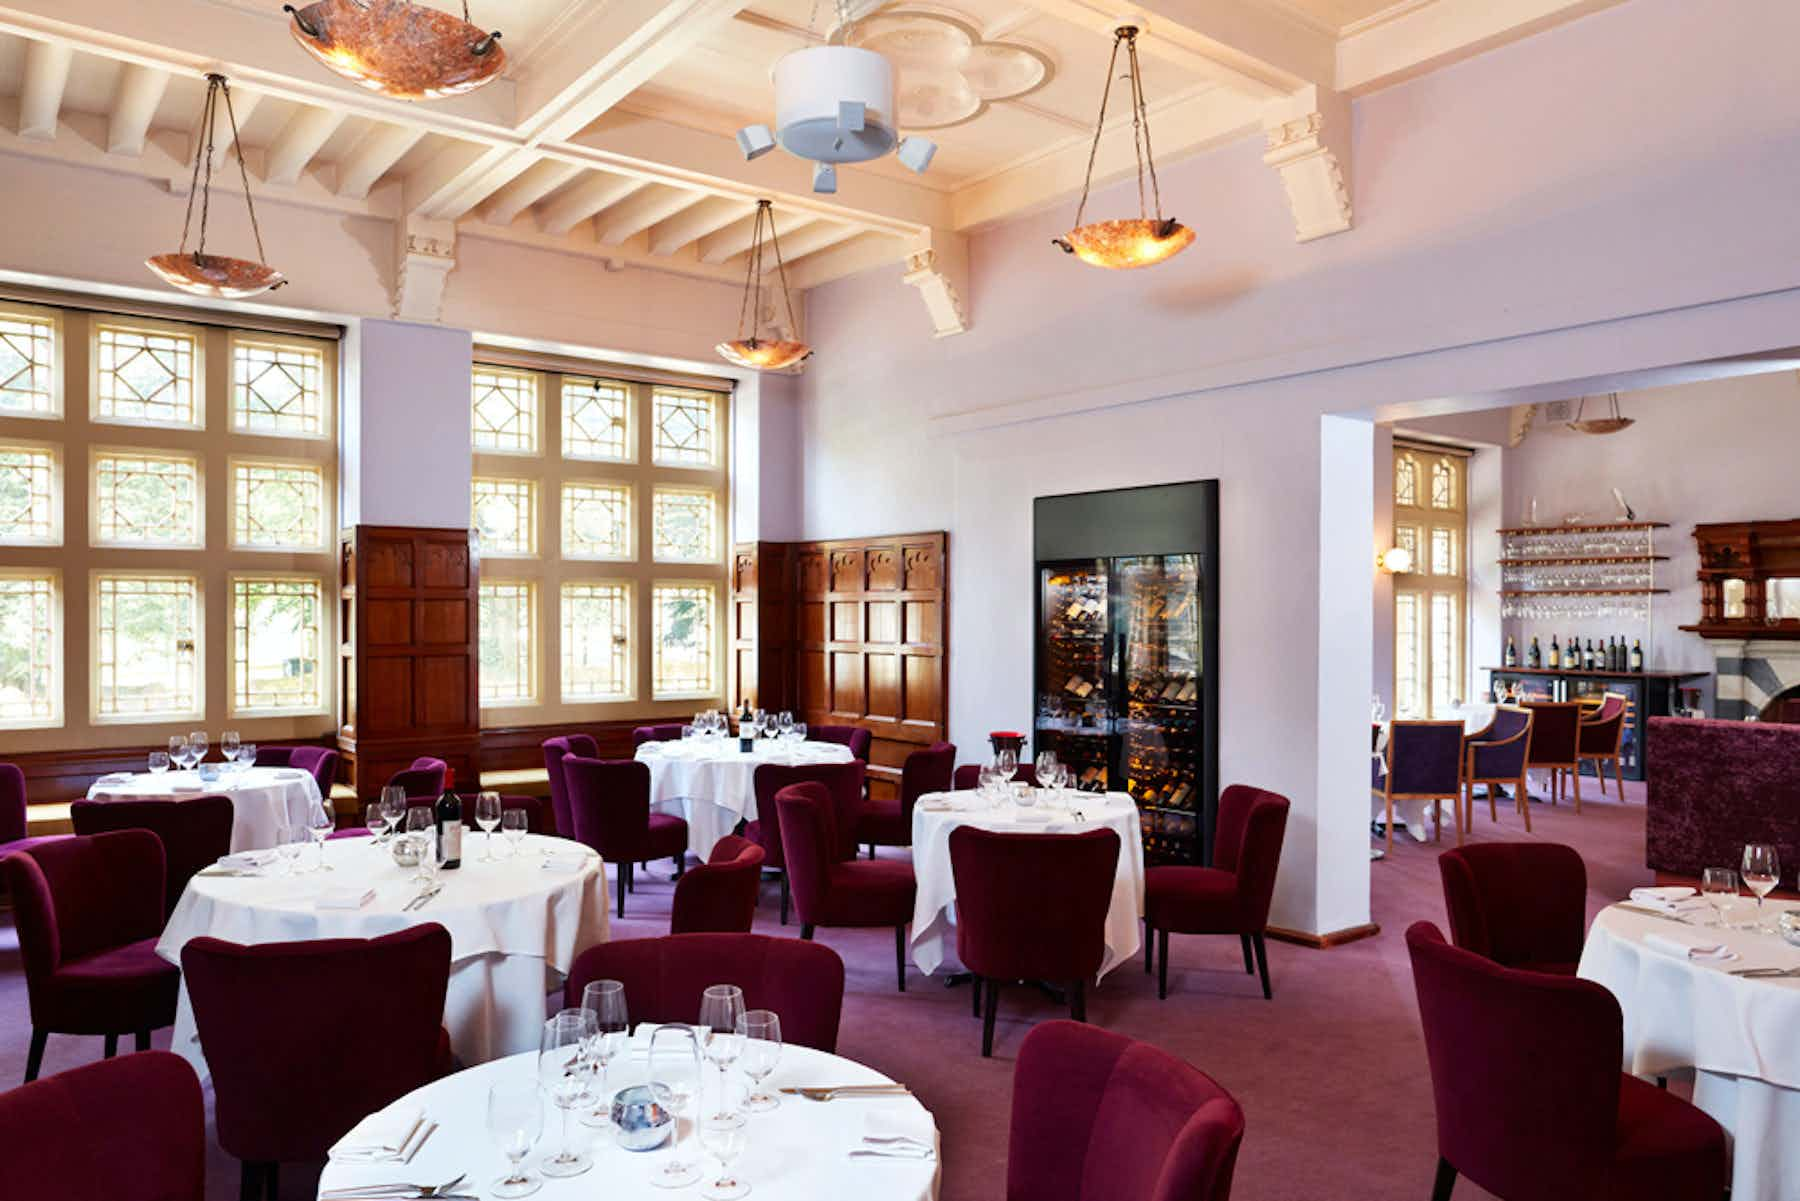 Burges Restaurant, Park House Restaurant & Fine Wine Bar